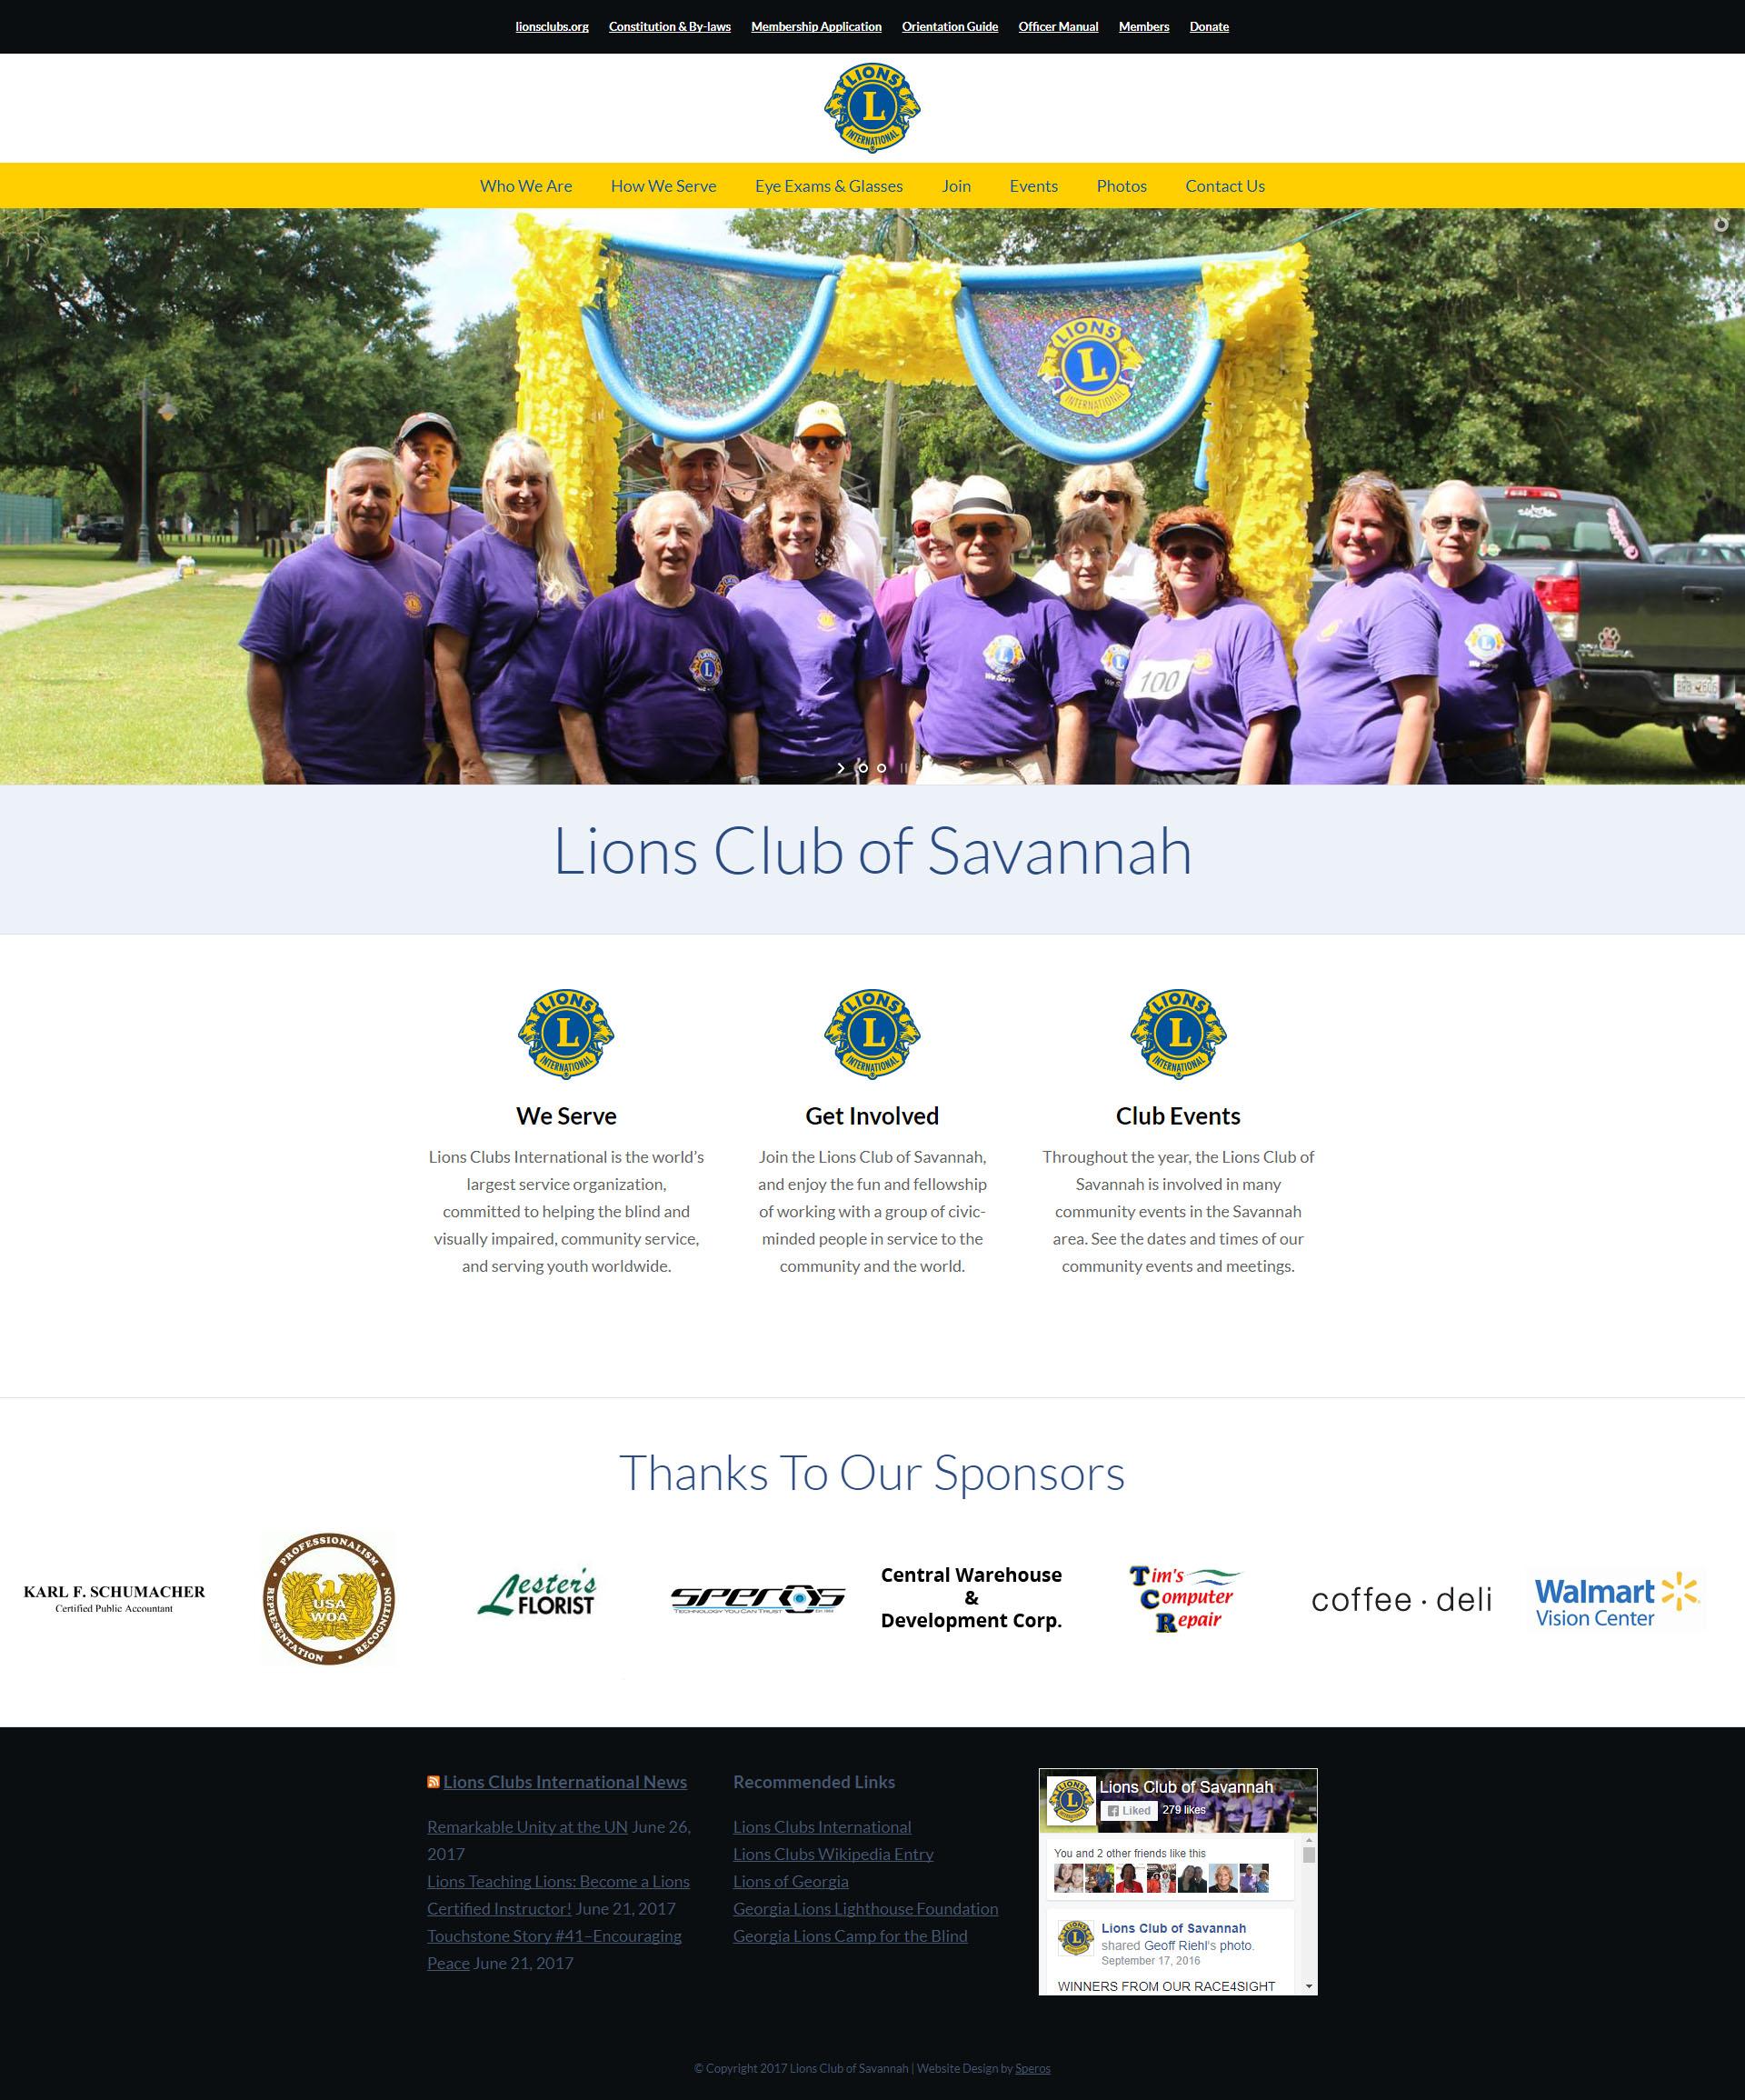 Lions Club of Savannah - Speros Web Design - Savannah